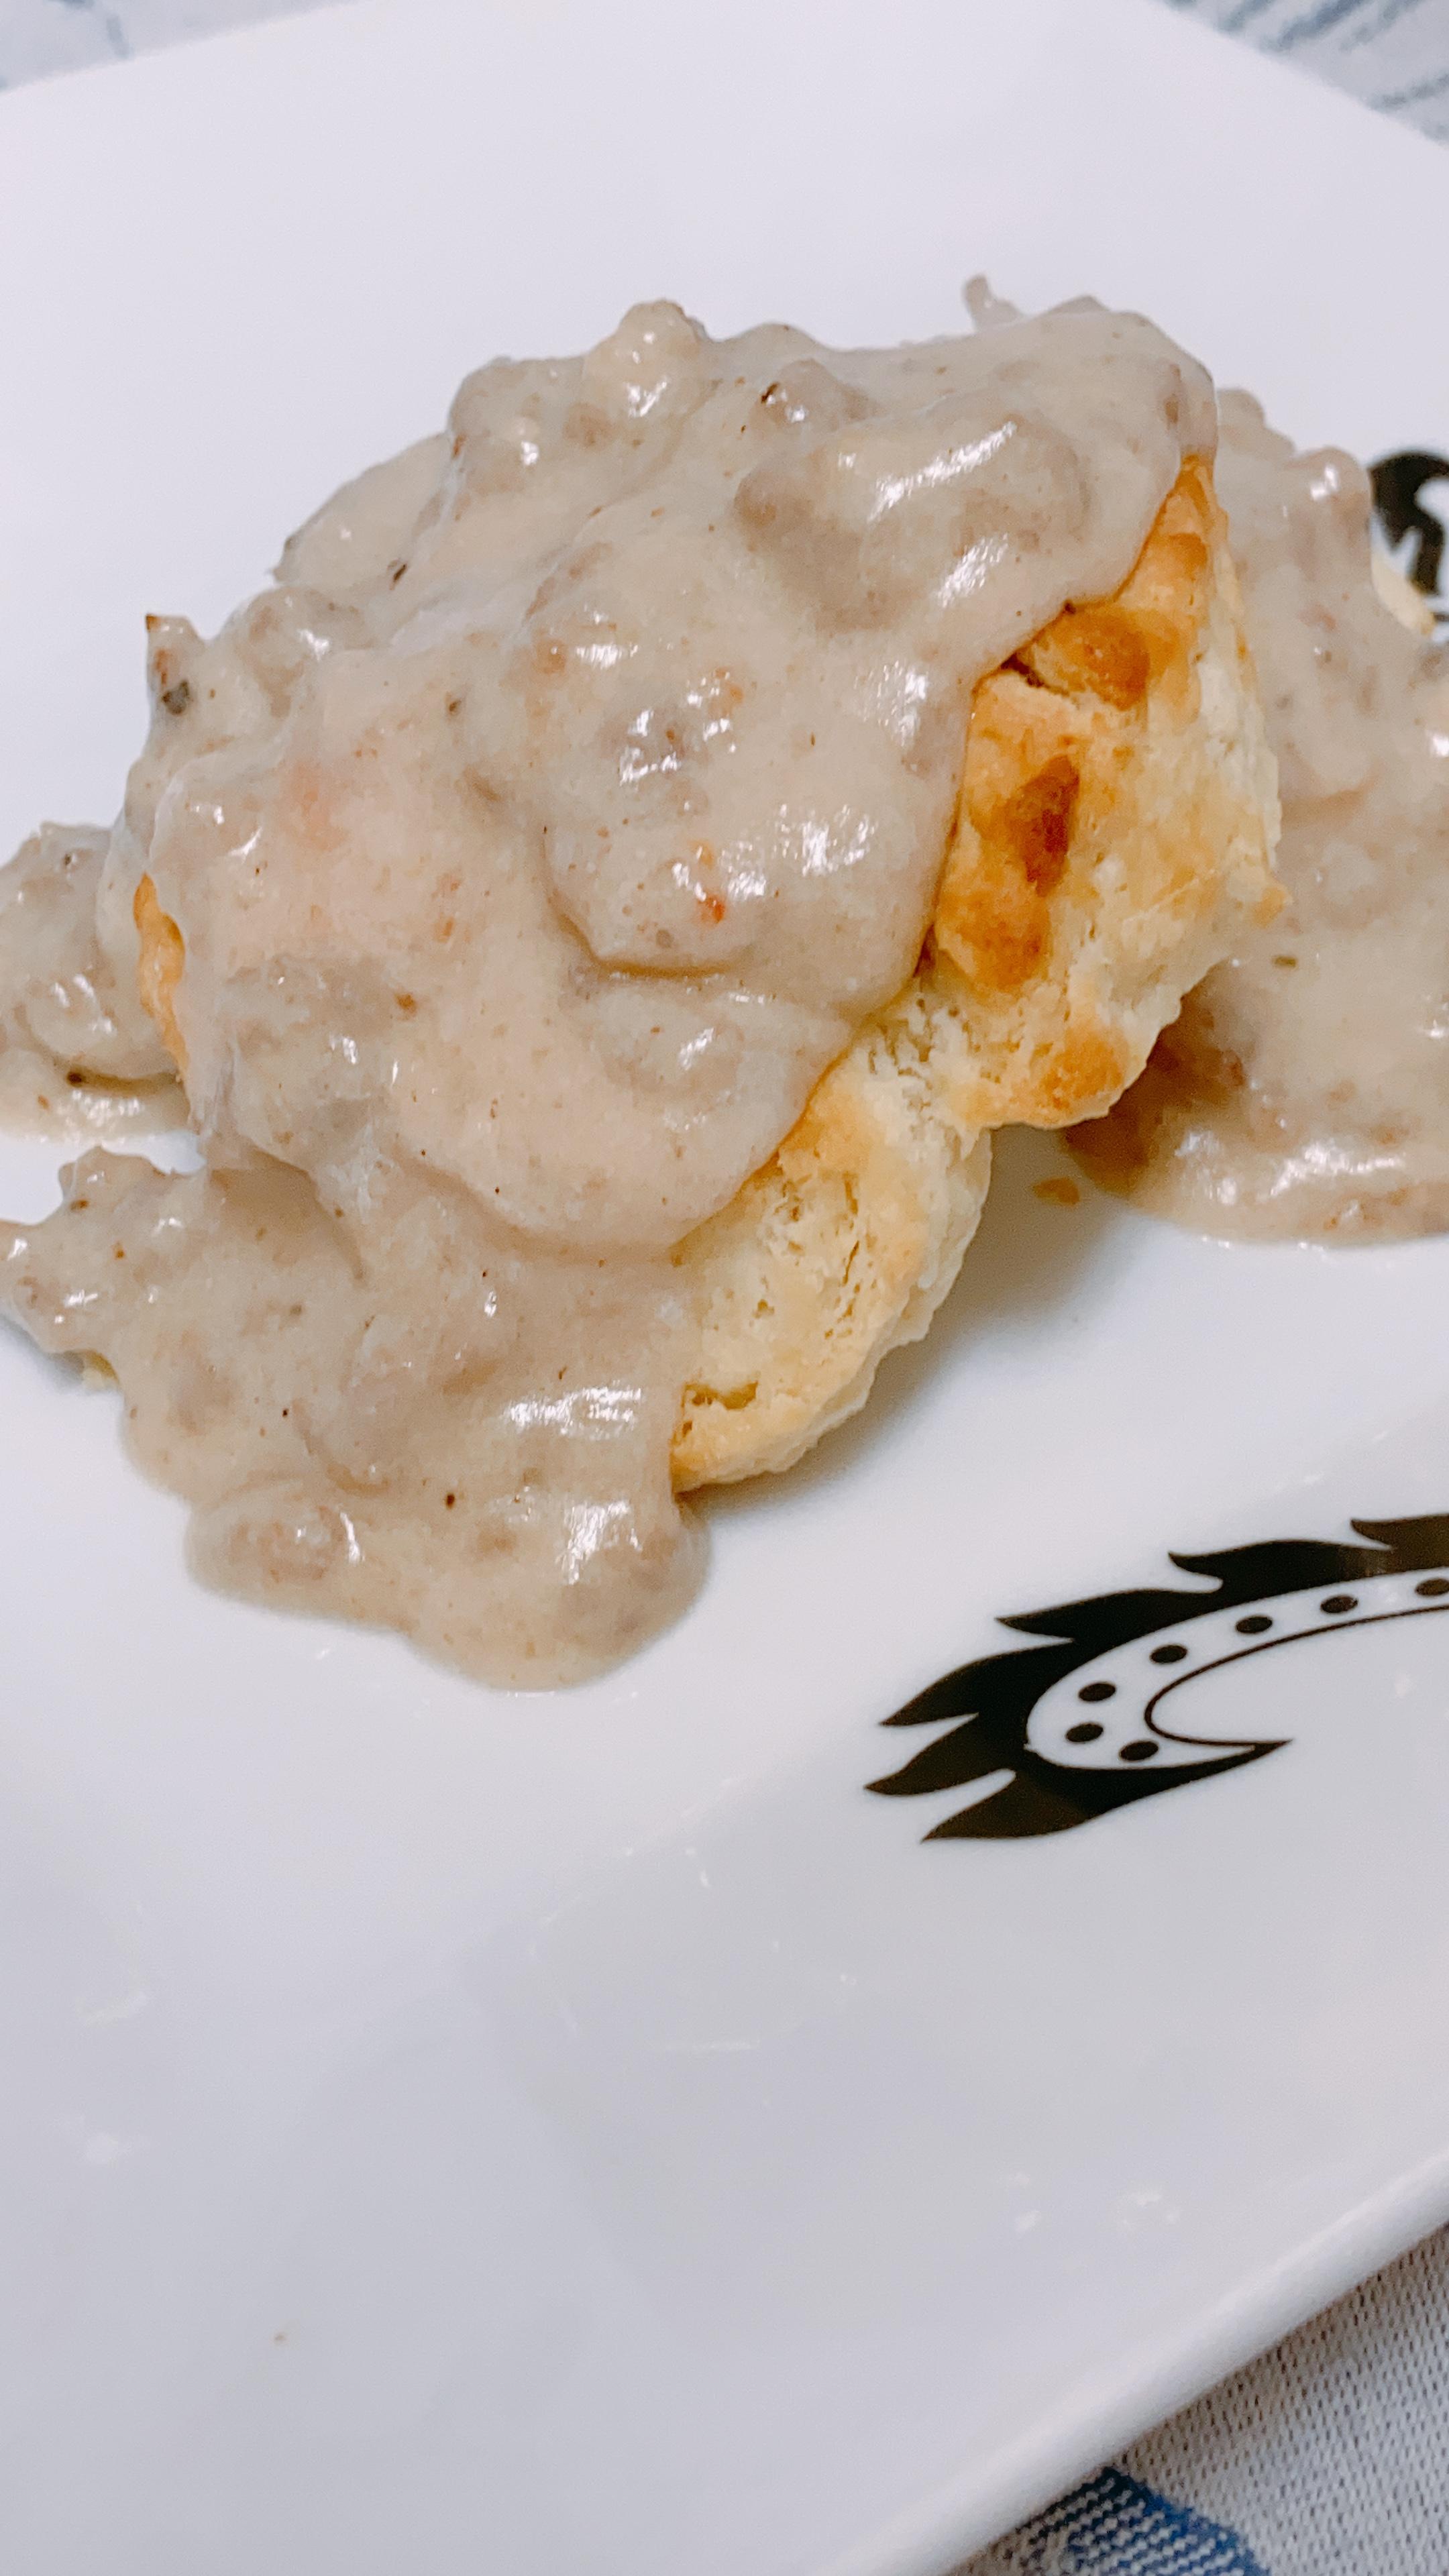 Biscuits with Herb Breakfast Sausage Gravy